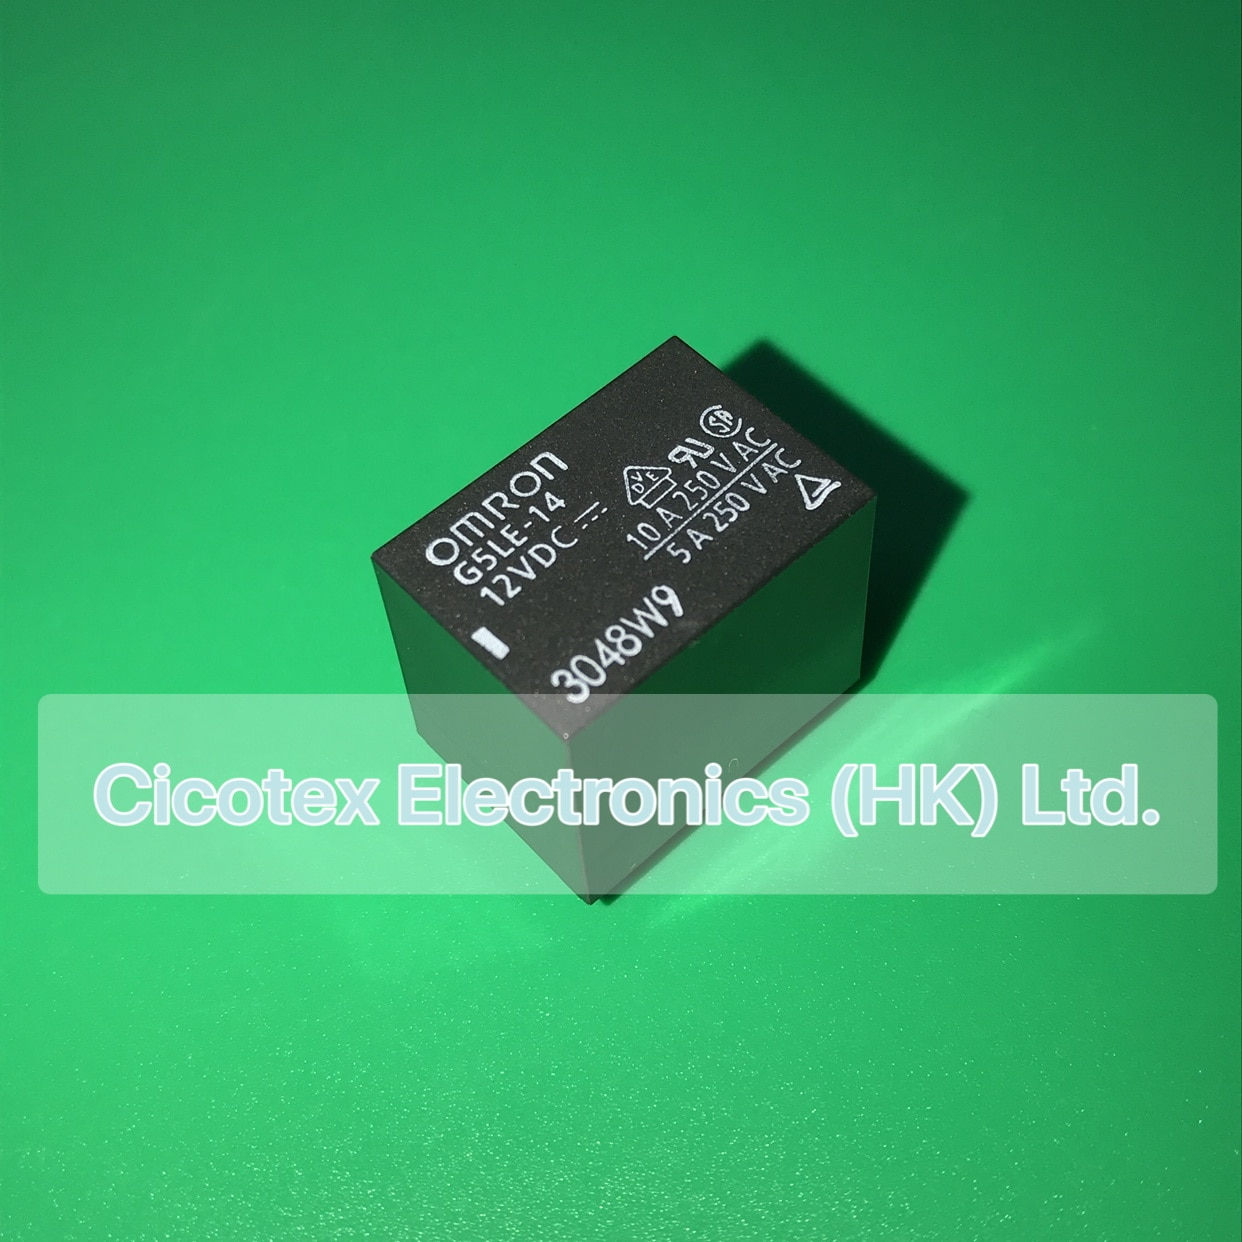 IC 2DI150A-120B para IGBT 2DI150A-120 2DI150A-12 2DI150A-1 2DI150A 2DI150 150